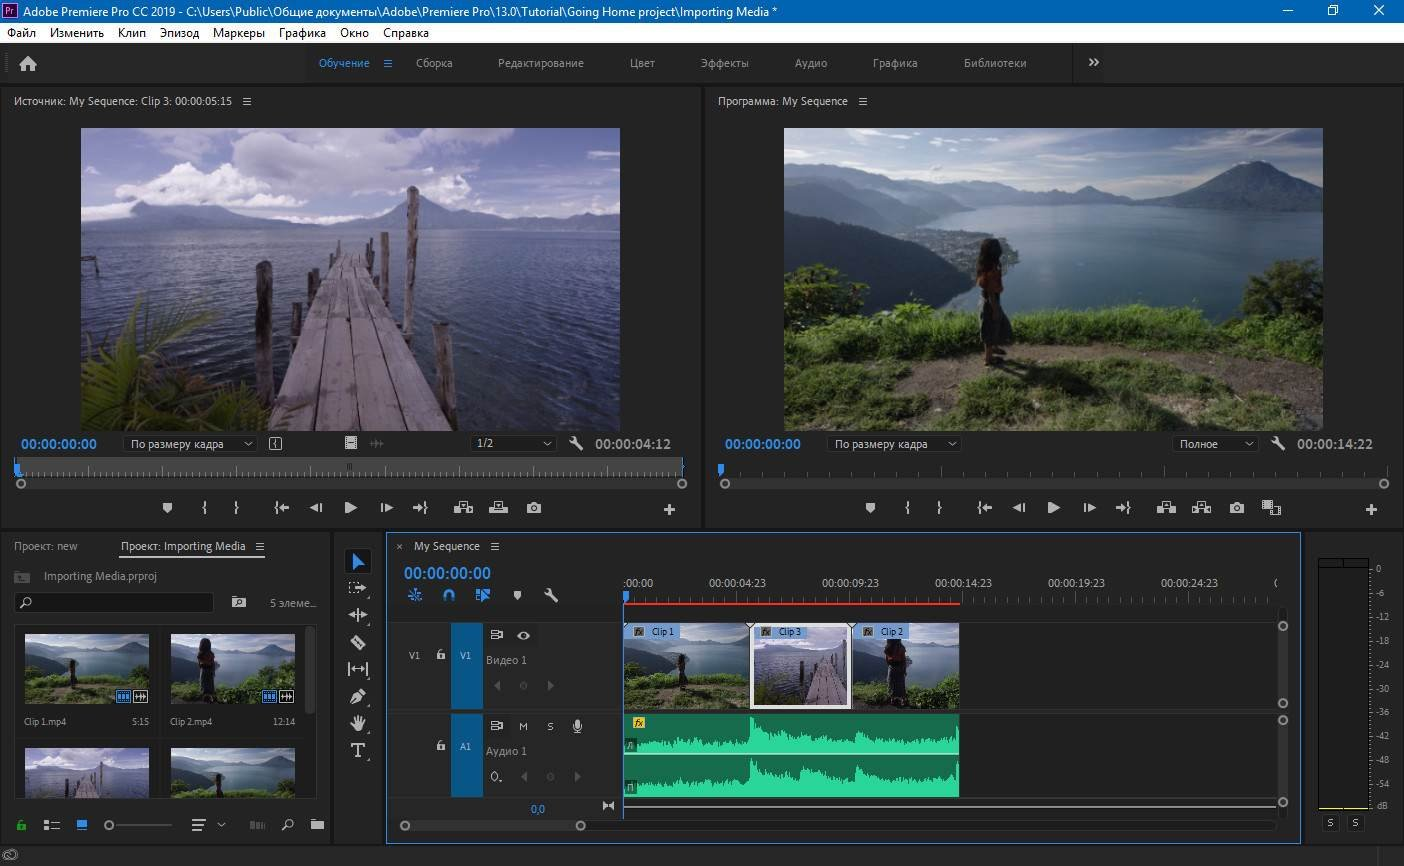 Adobe Premiere Pro CC 2021 14.8.0.39 repack kpojiuk